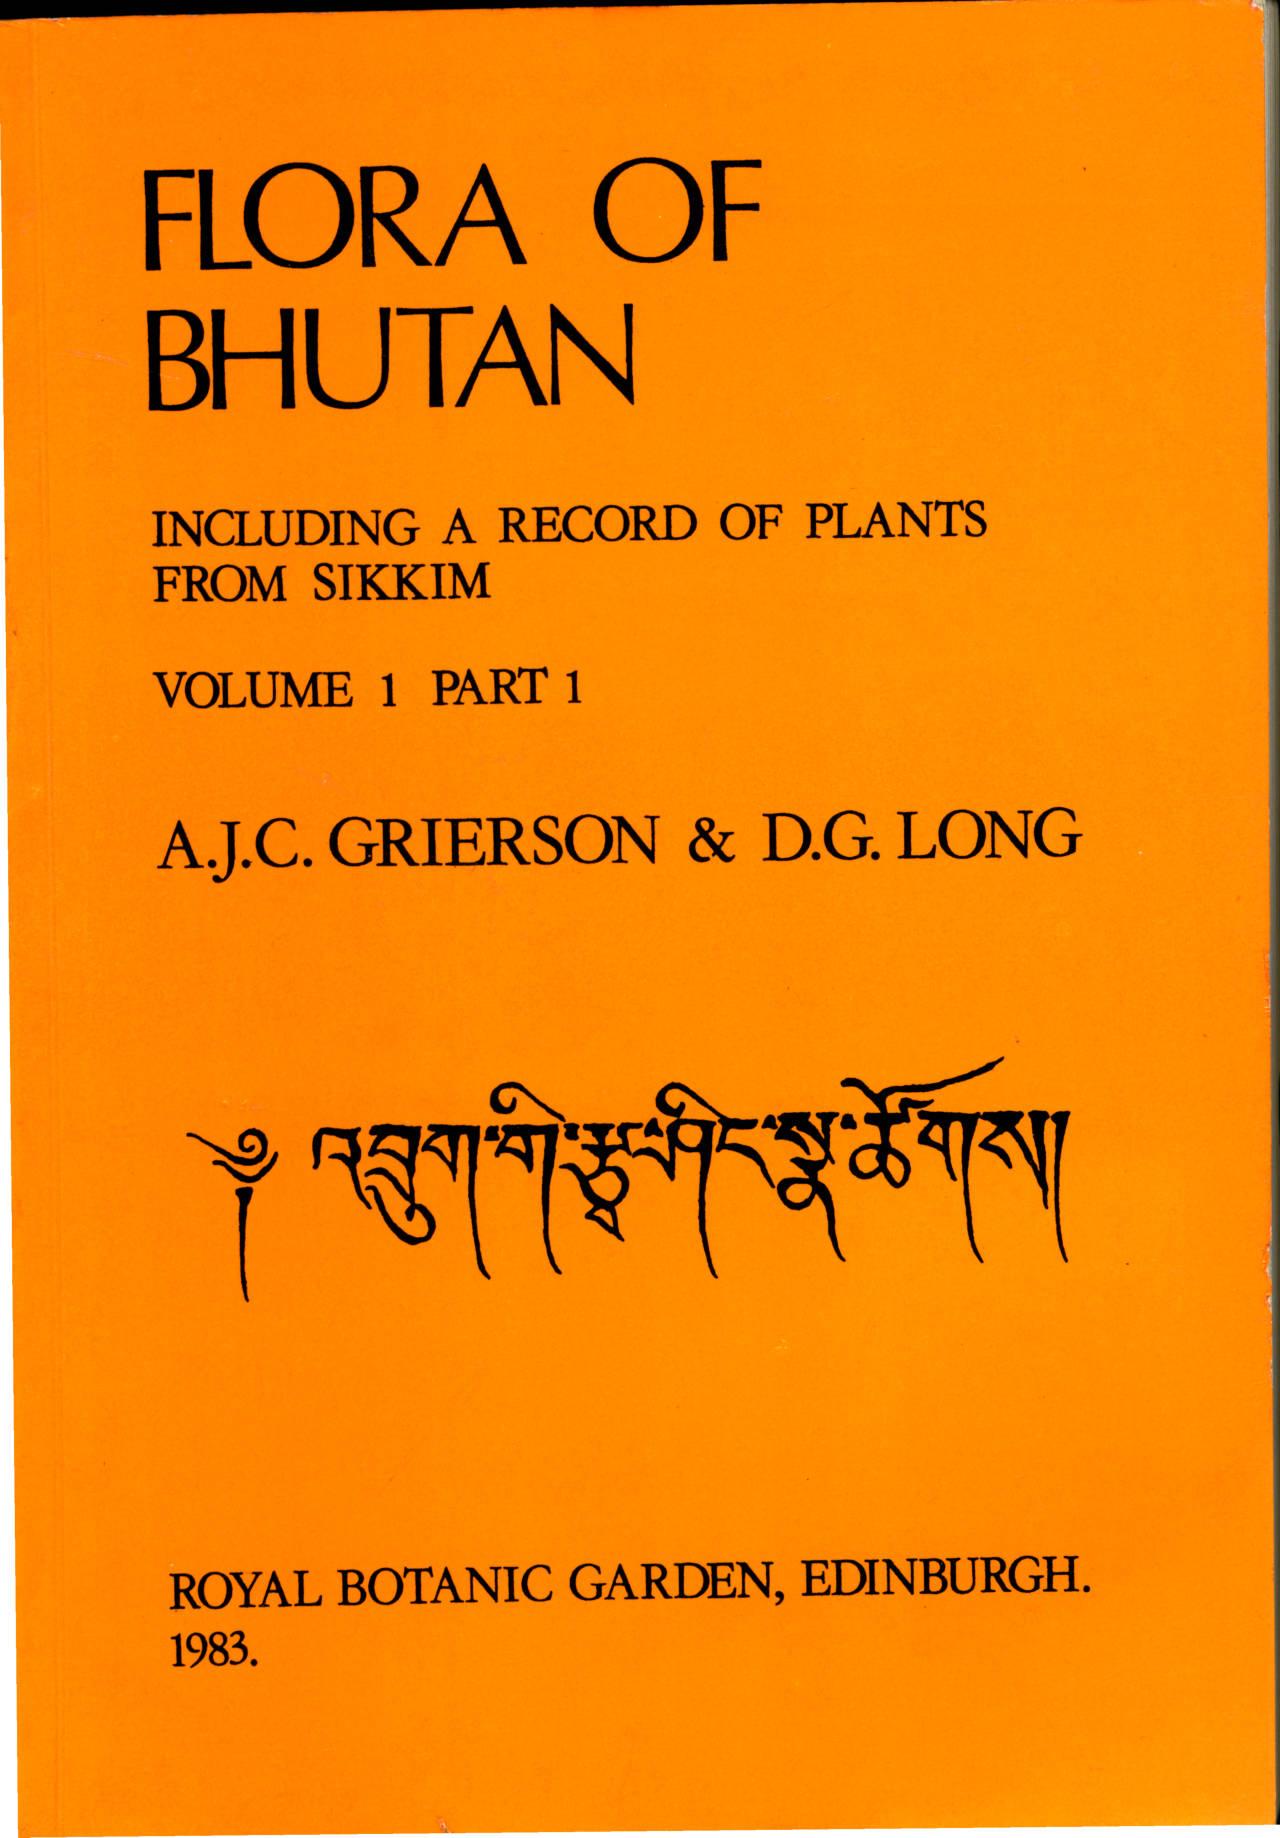 FLORA OF BHUTAN VOLUME 1 PART 1